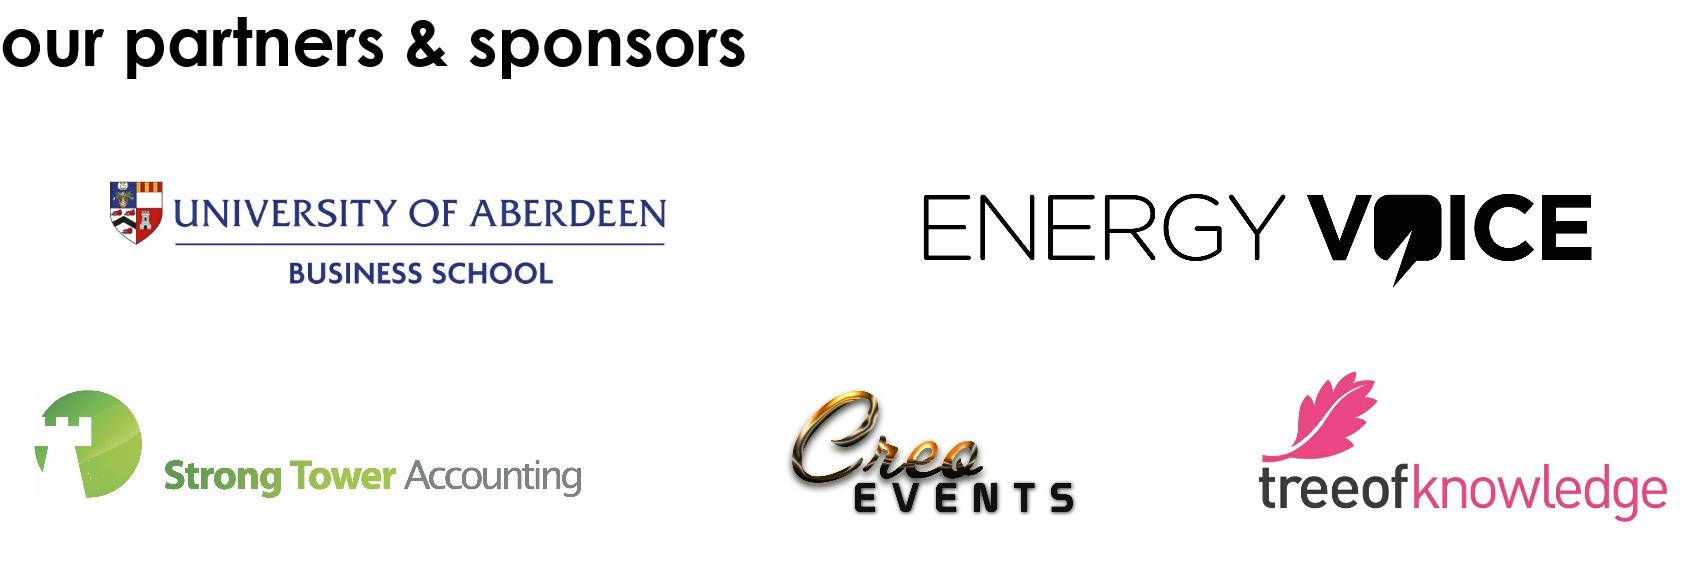 2017 leadership conference sponsors